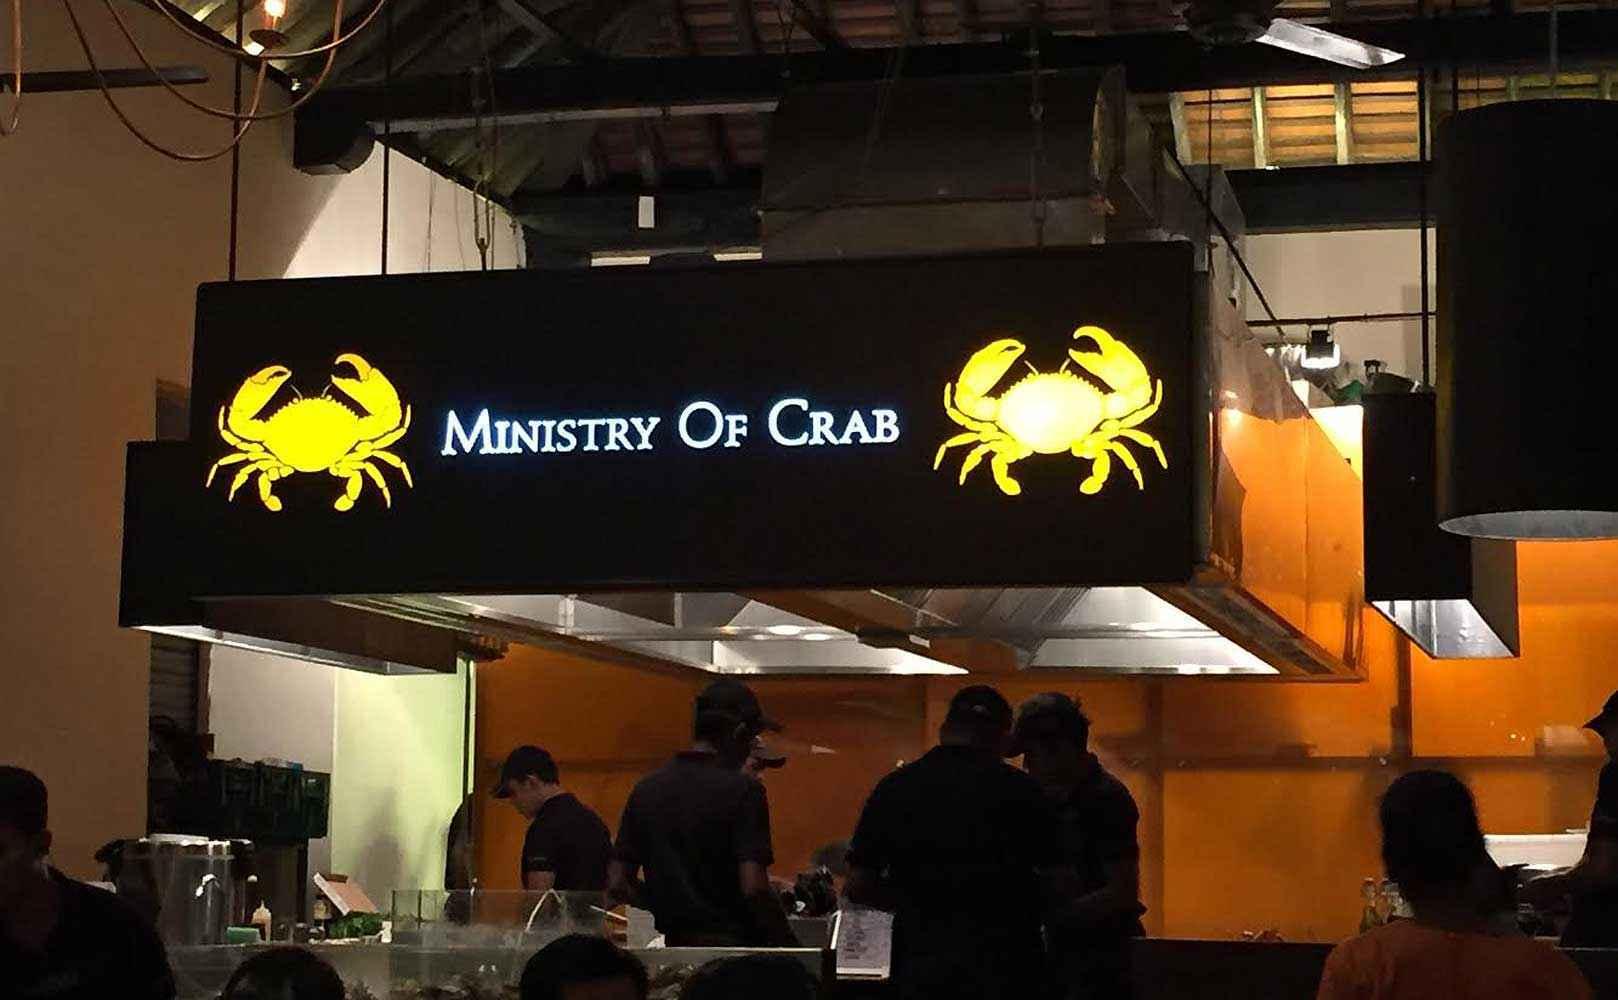 Go to Restaurantkritik: Ministry of Crab in 4, Old Dutch Hospital, Colombo 01, Sri Lanka